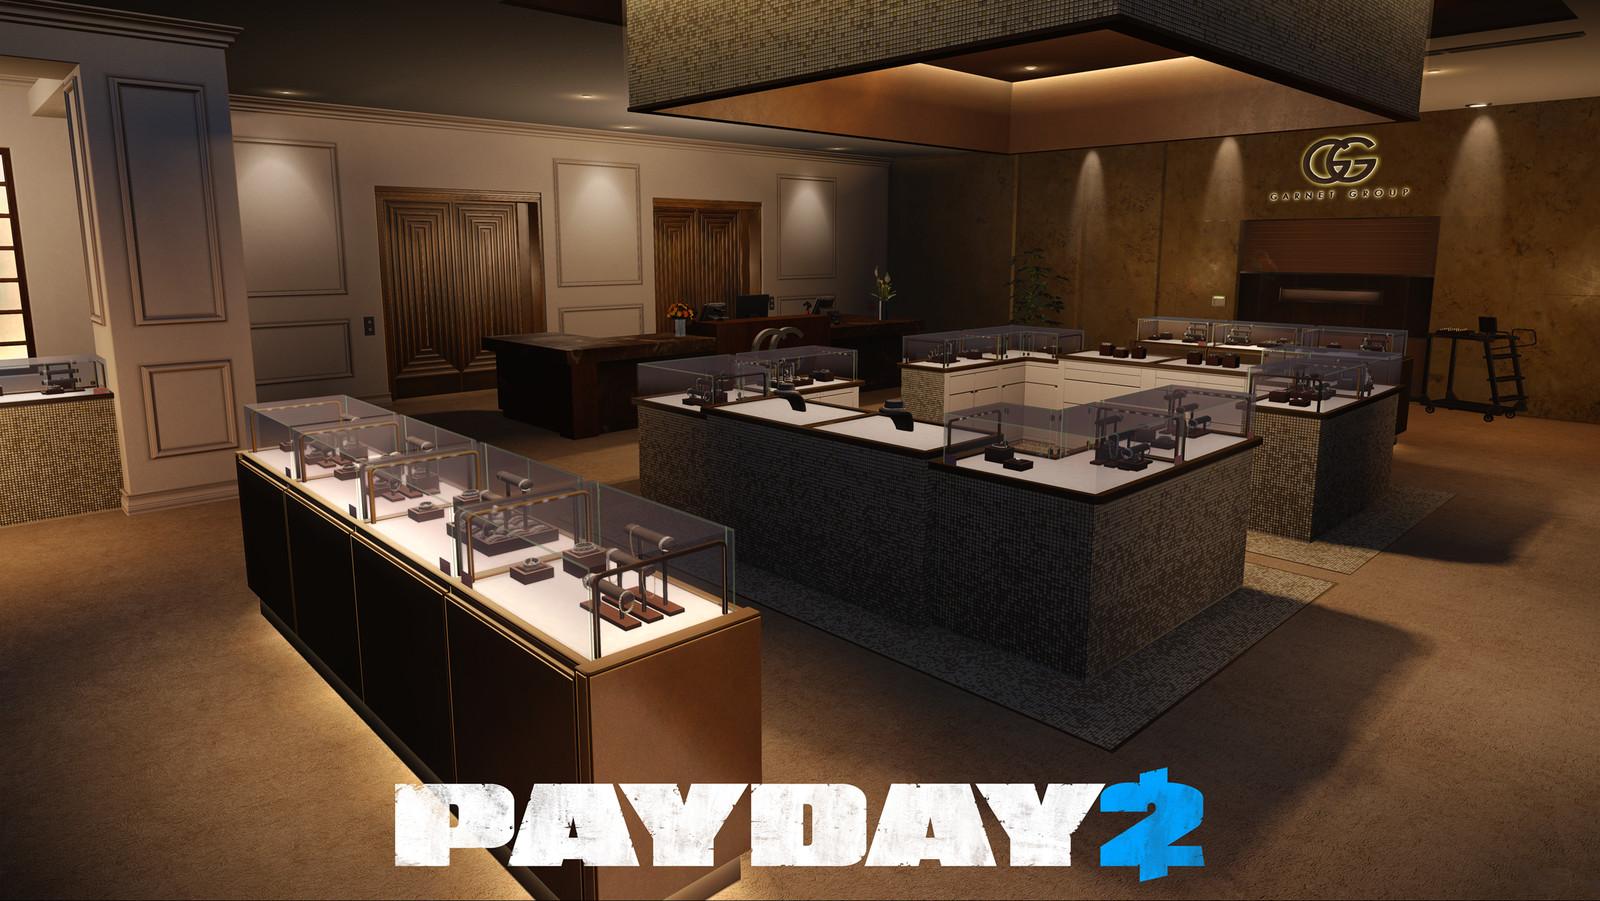 Payday 2: Reservoir Dogs DLC